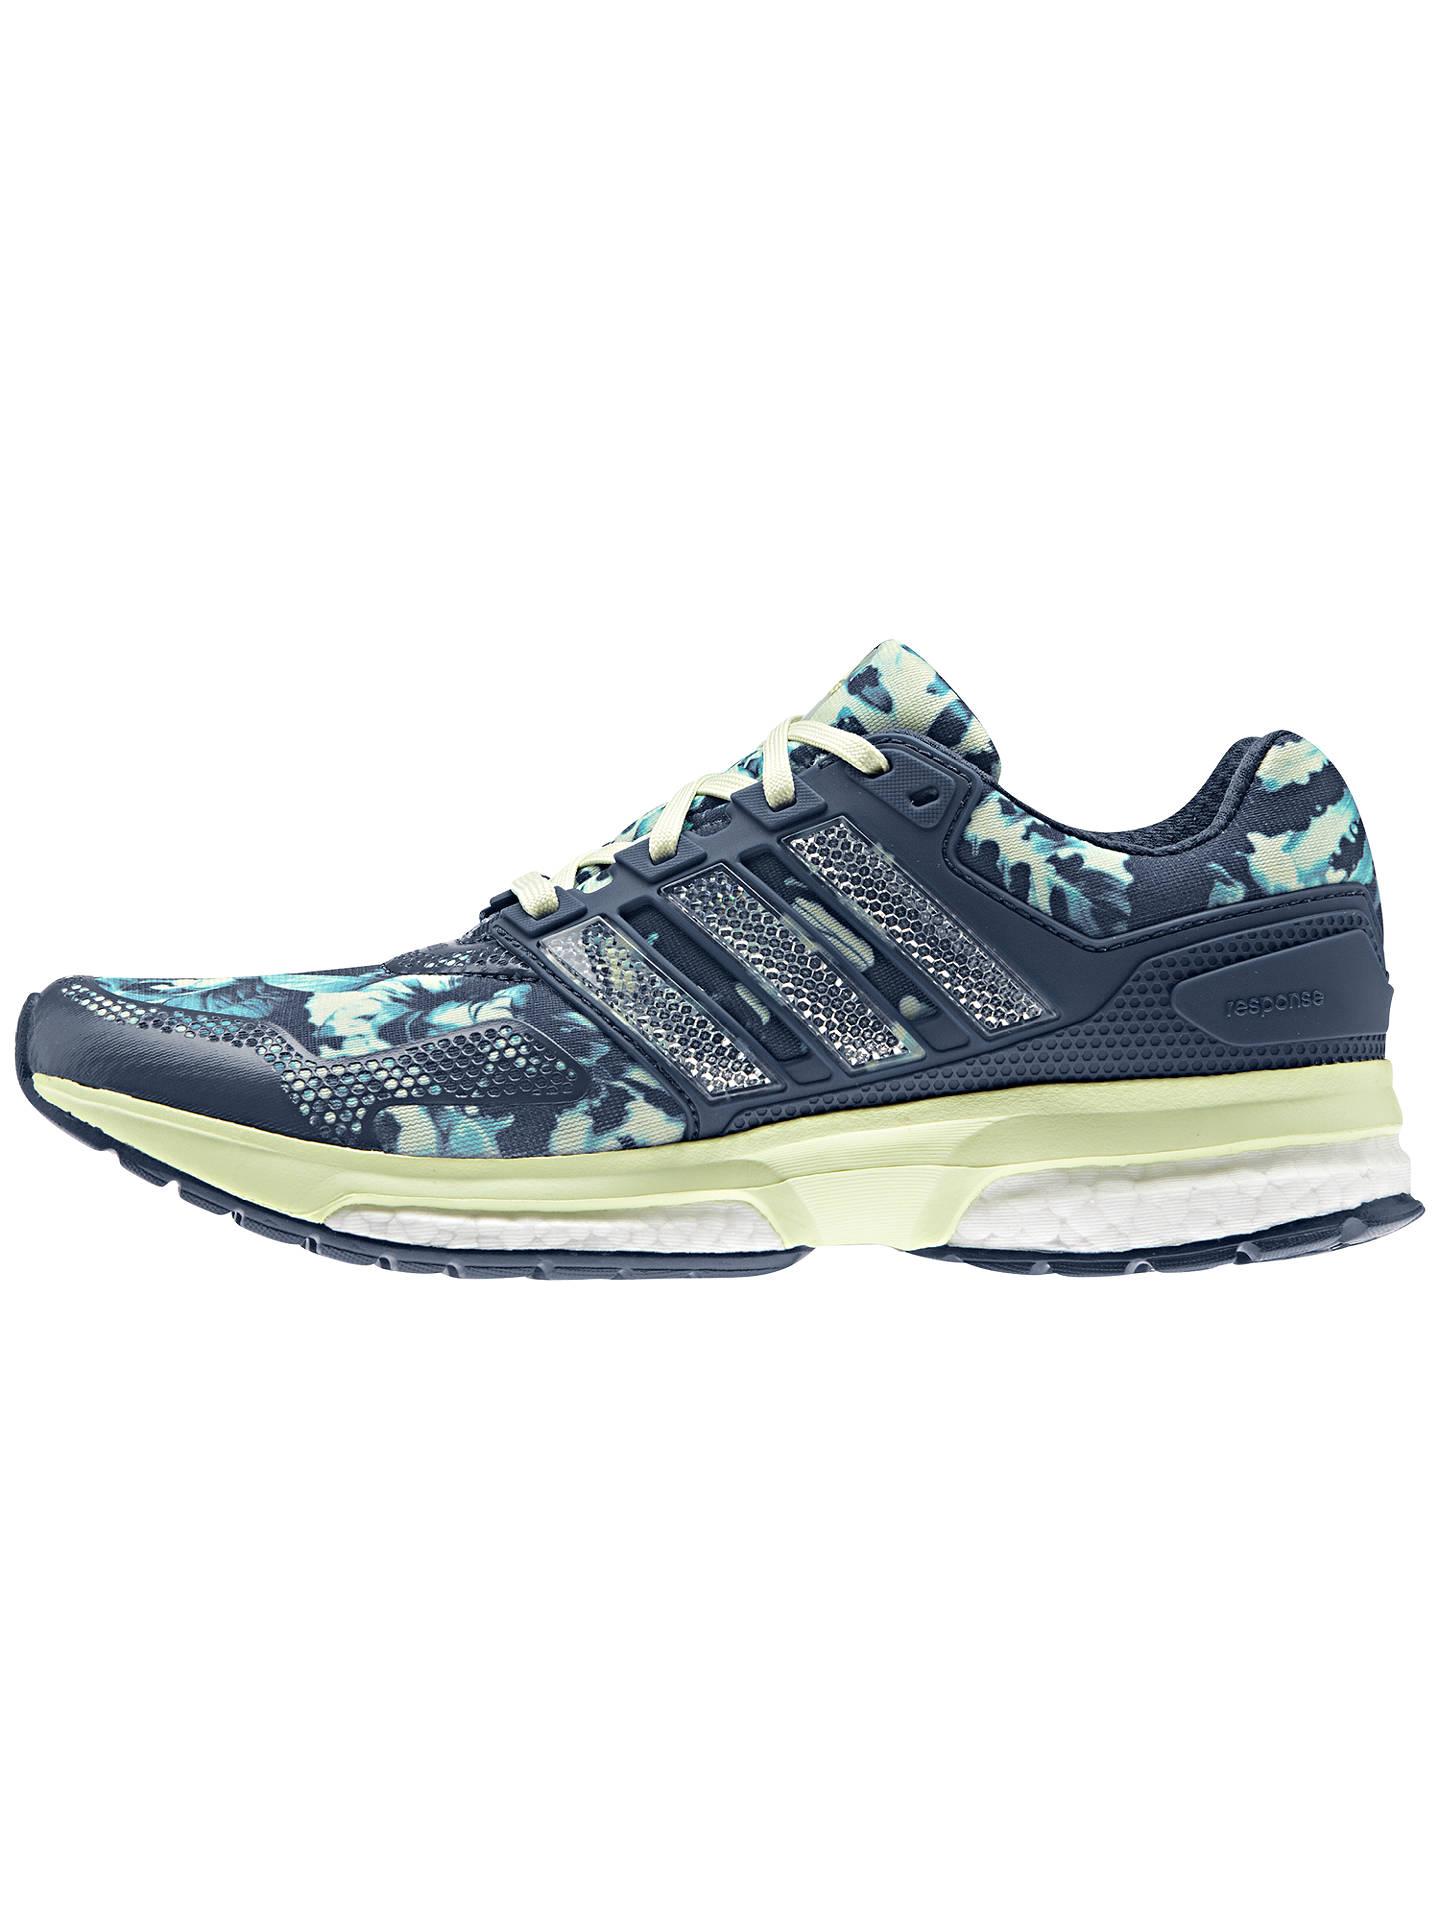 9e0f0fea3c0f4c BuyAdidas Response 2 Graphic Women s Running Shoes